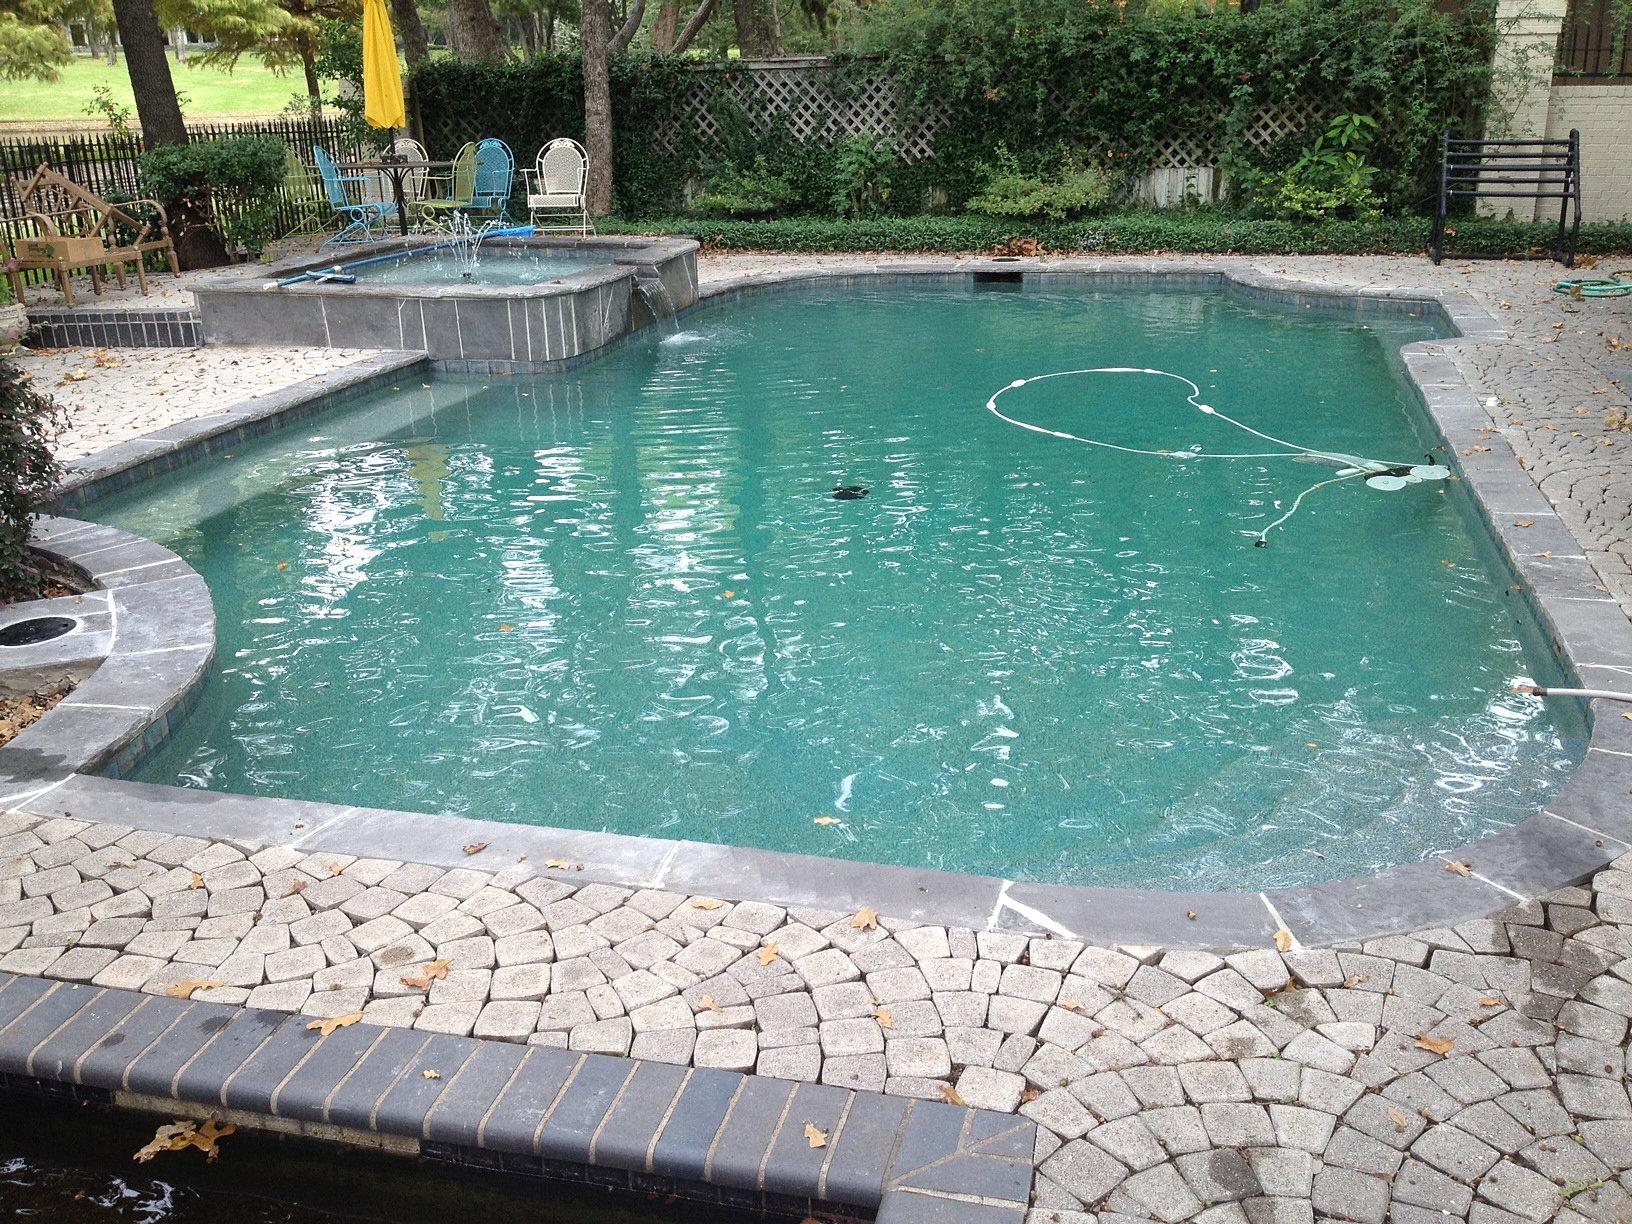 Swimming Pool Remodel Pool Tile And Pool Resurfacing Silvermist Flagstone Pool Coping